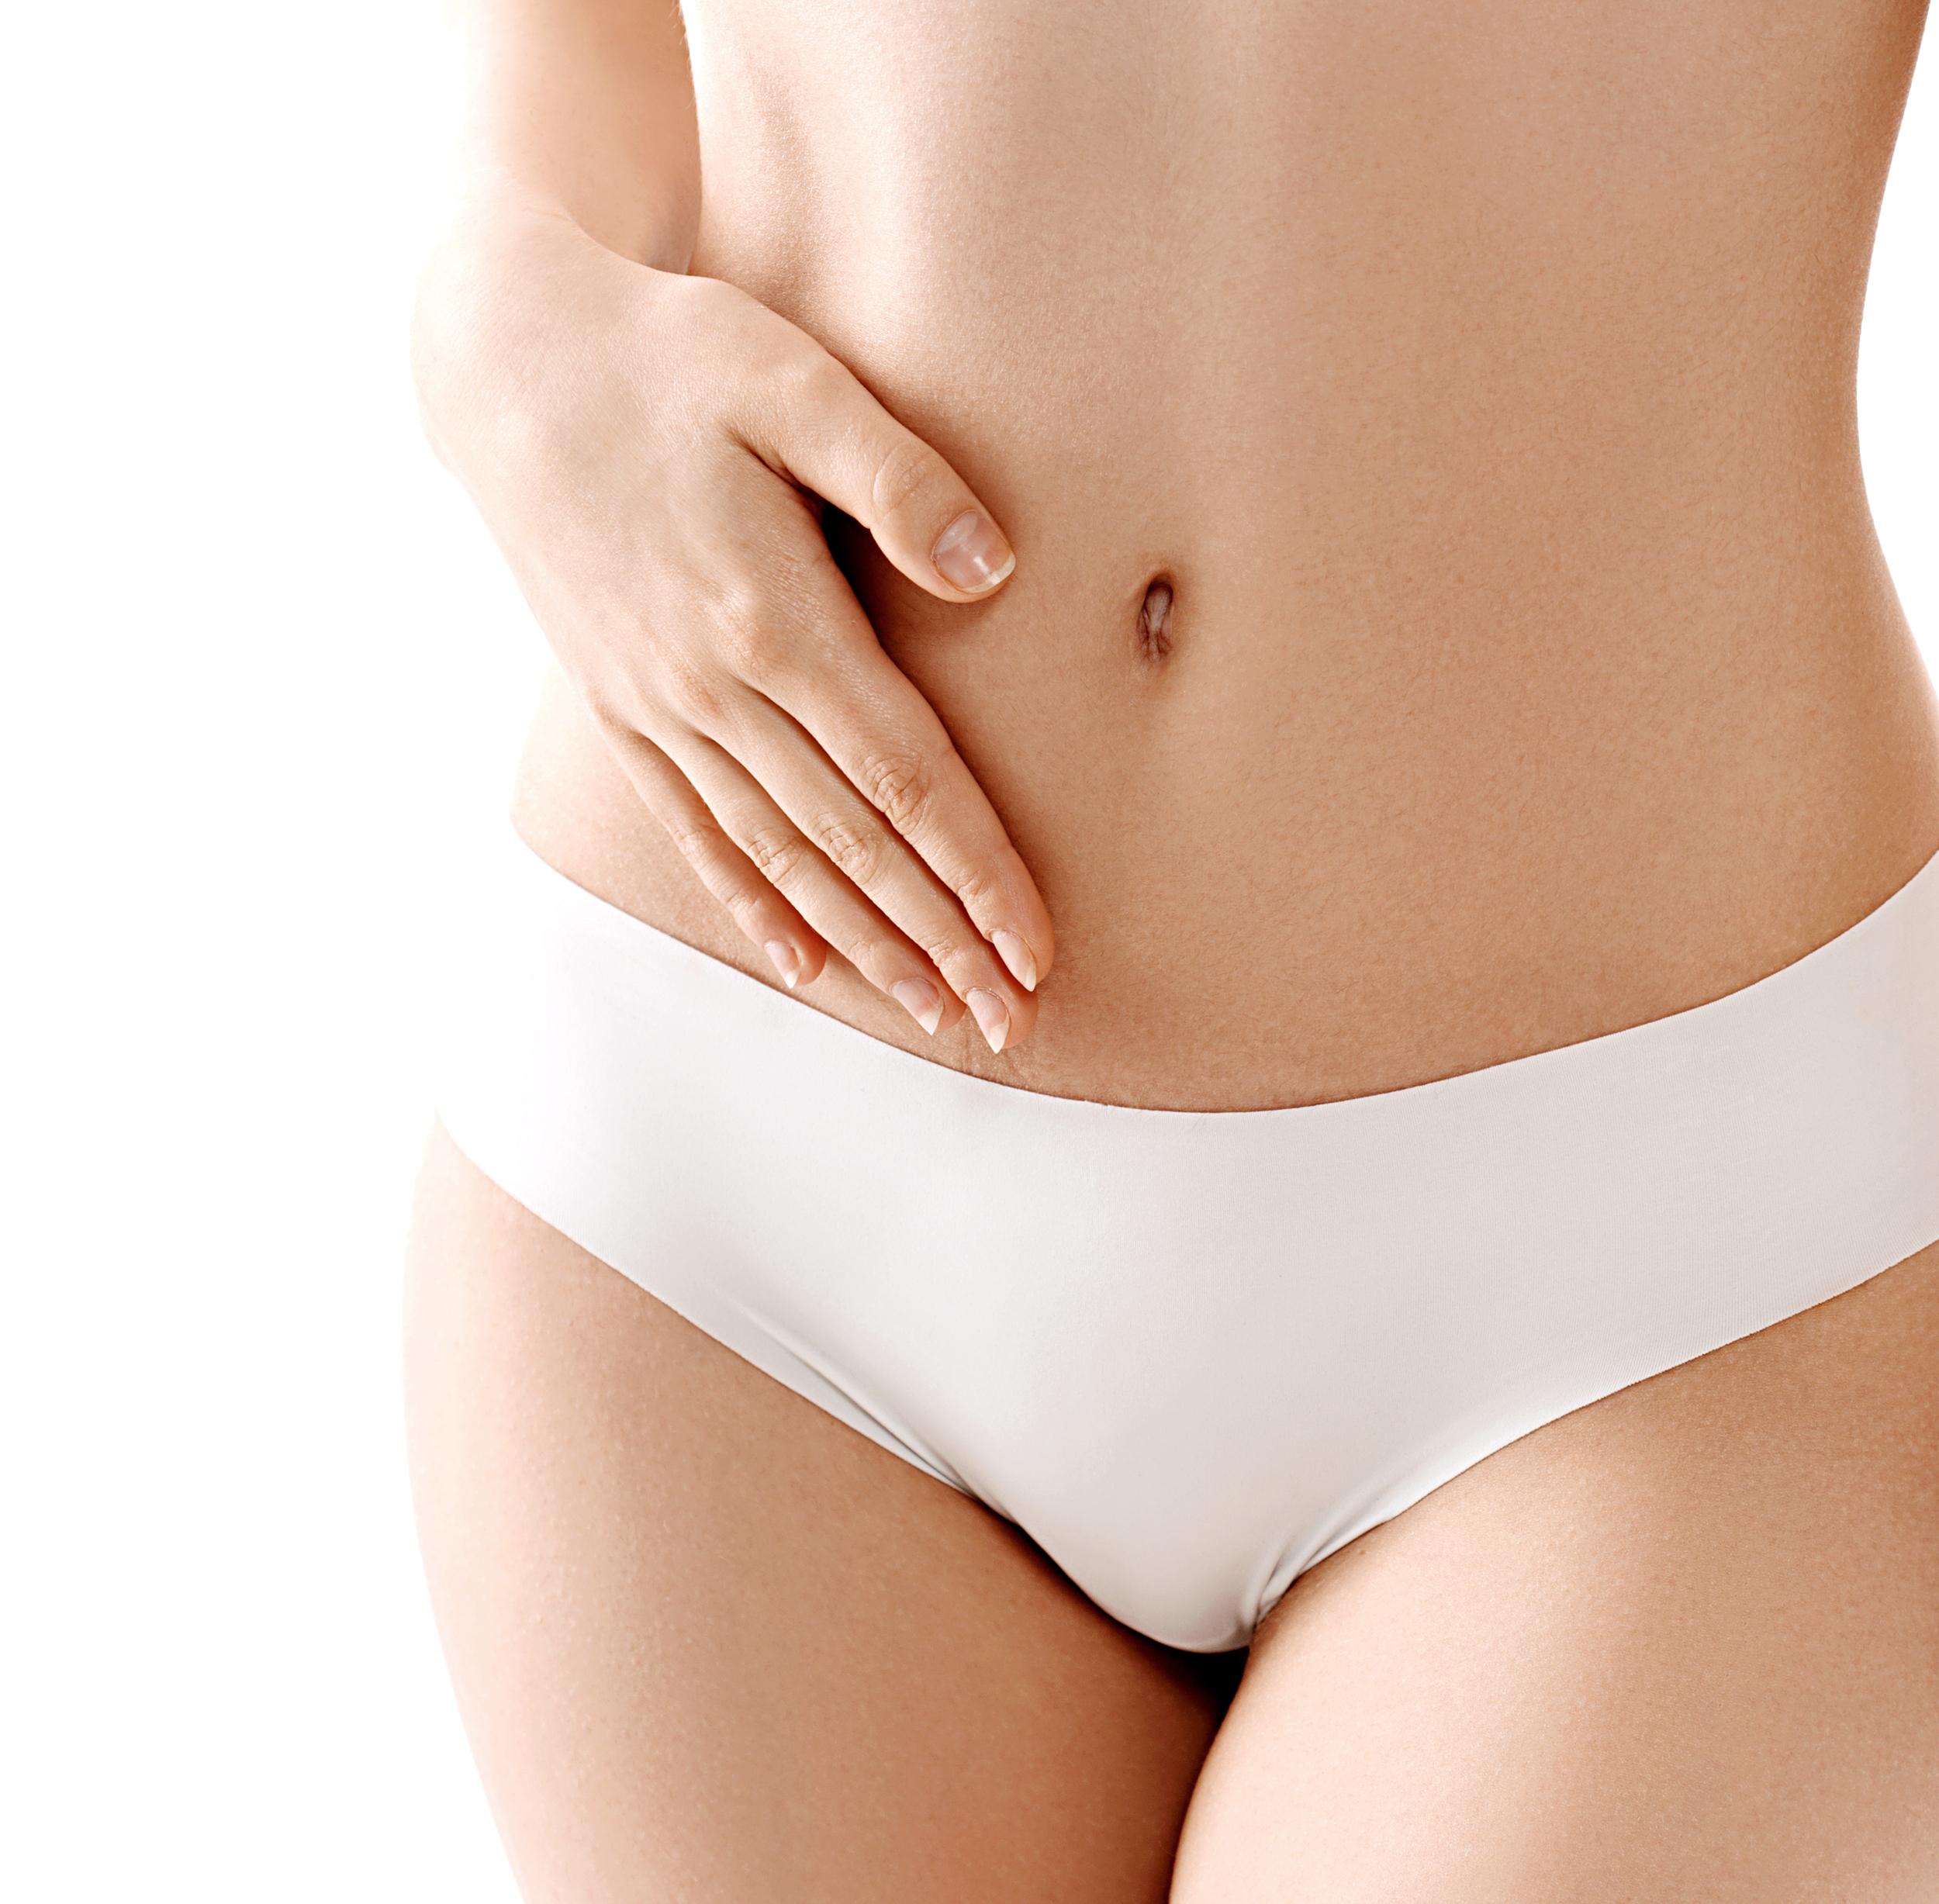 Beautiful vulva photos can read